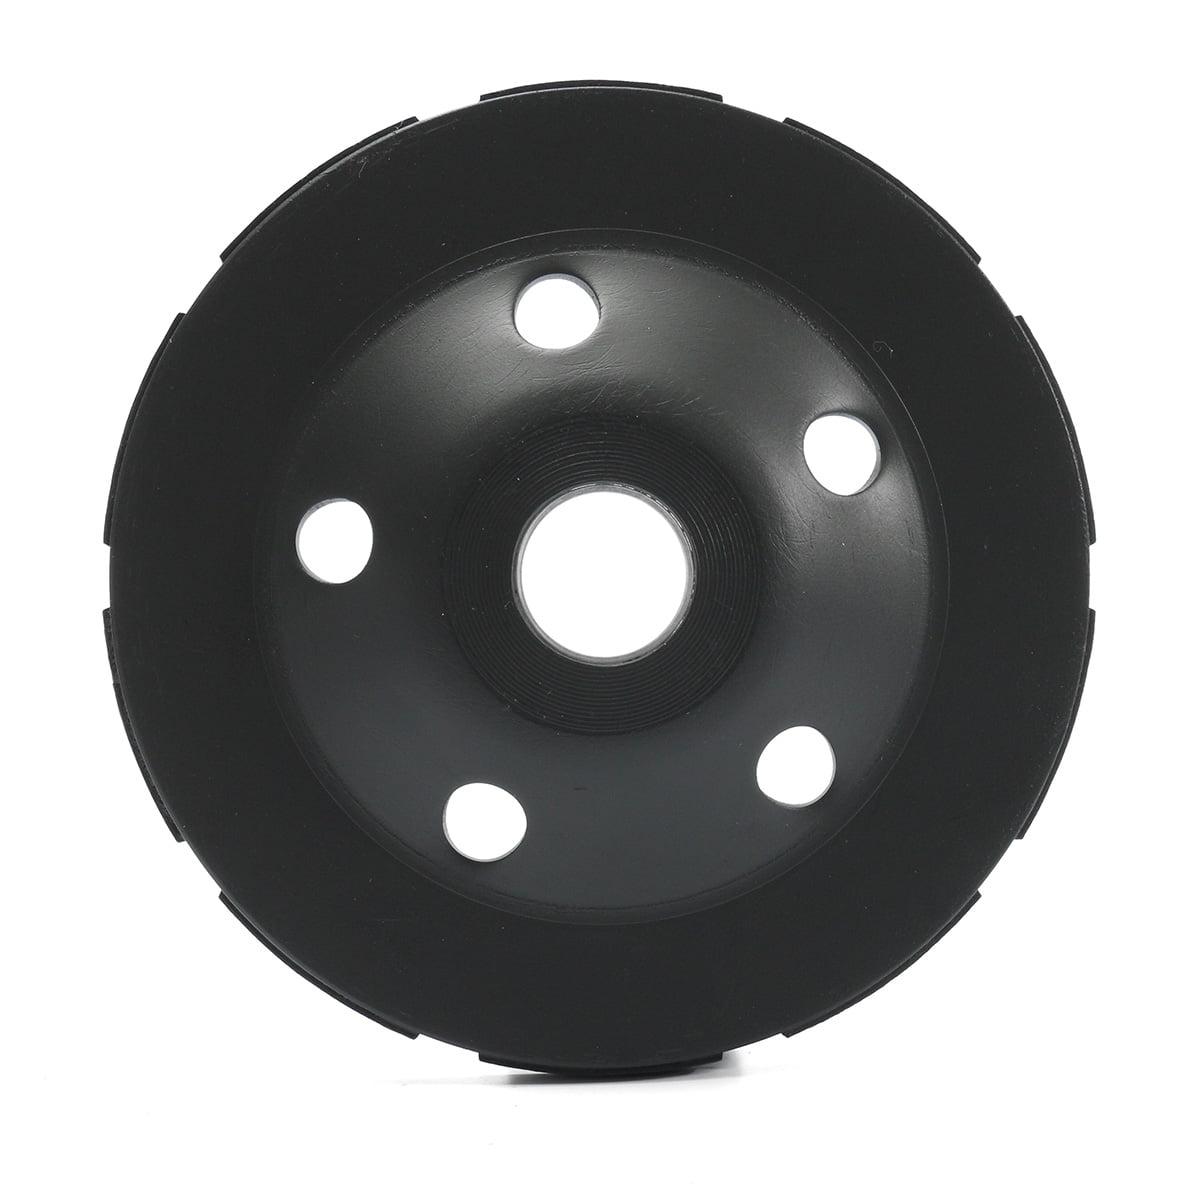 125mm Diamond Segment Grinding Cup Wheel Disc for Concrete Granite Stone New